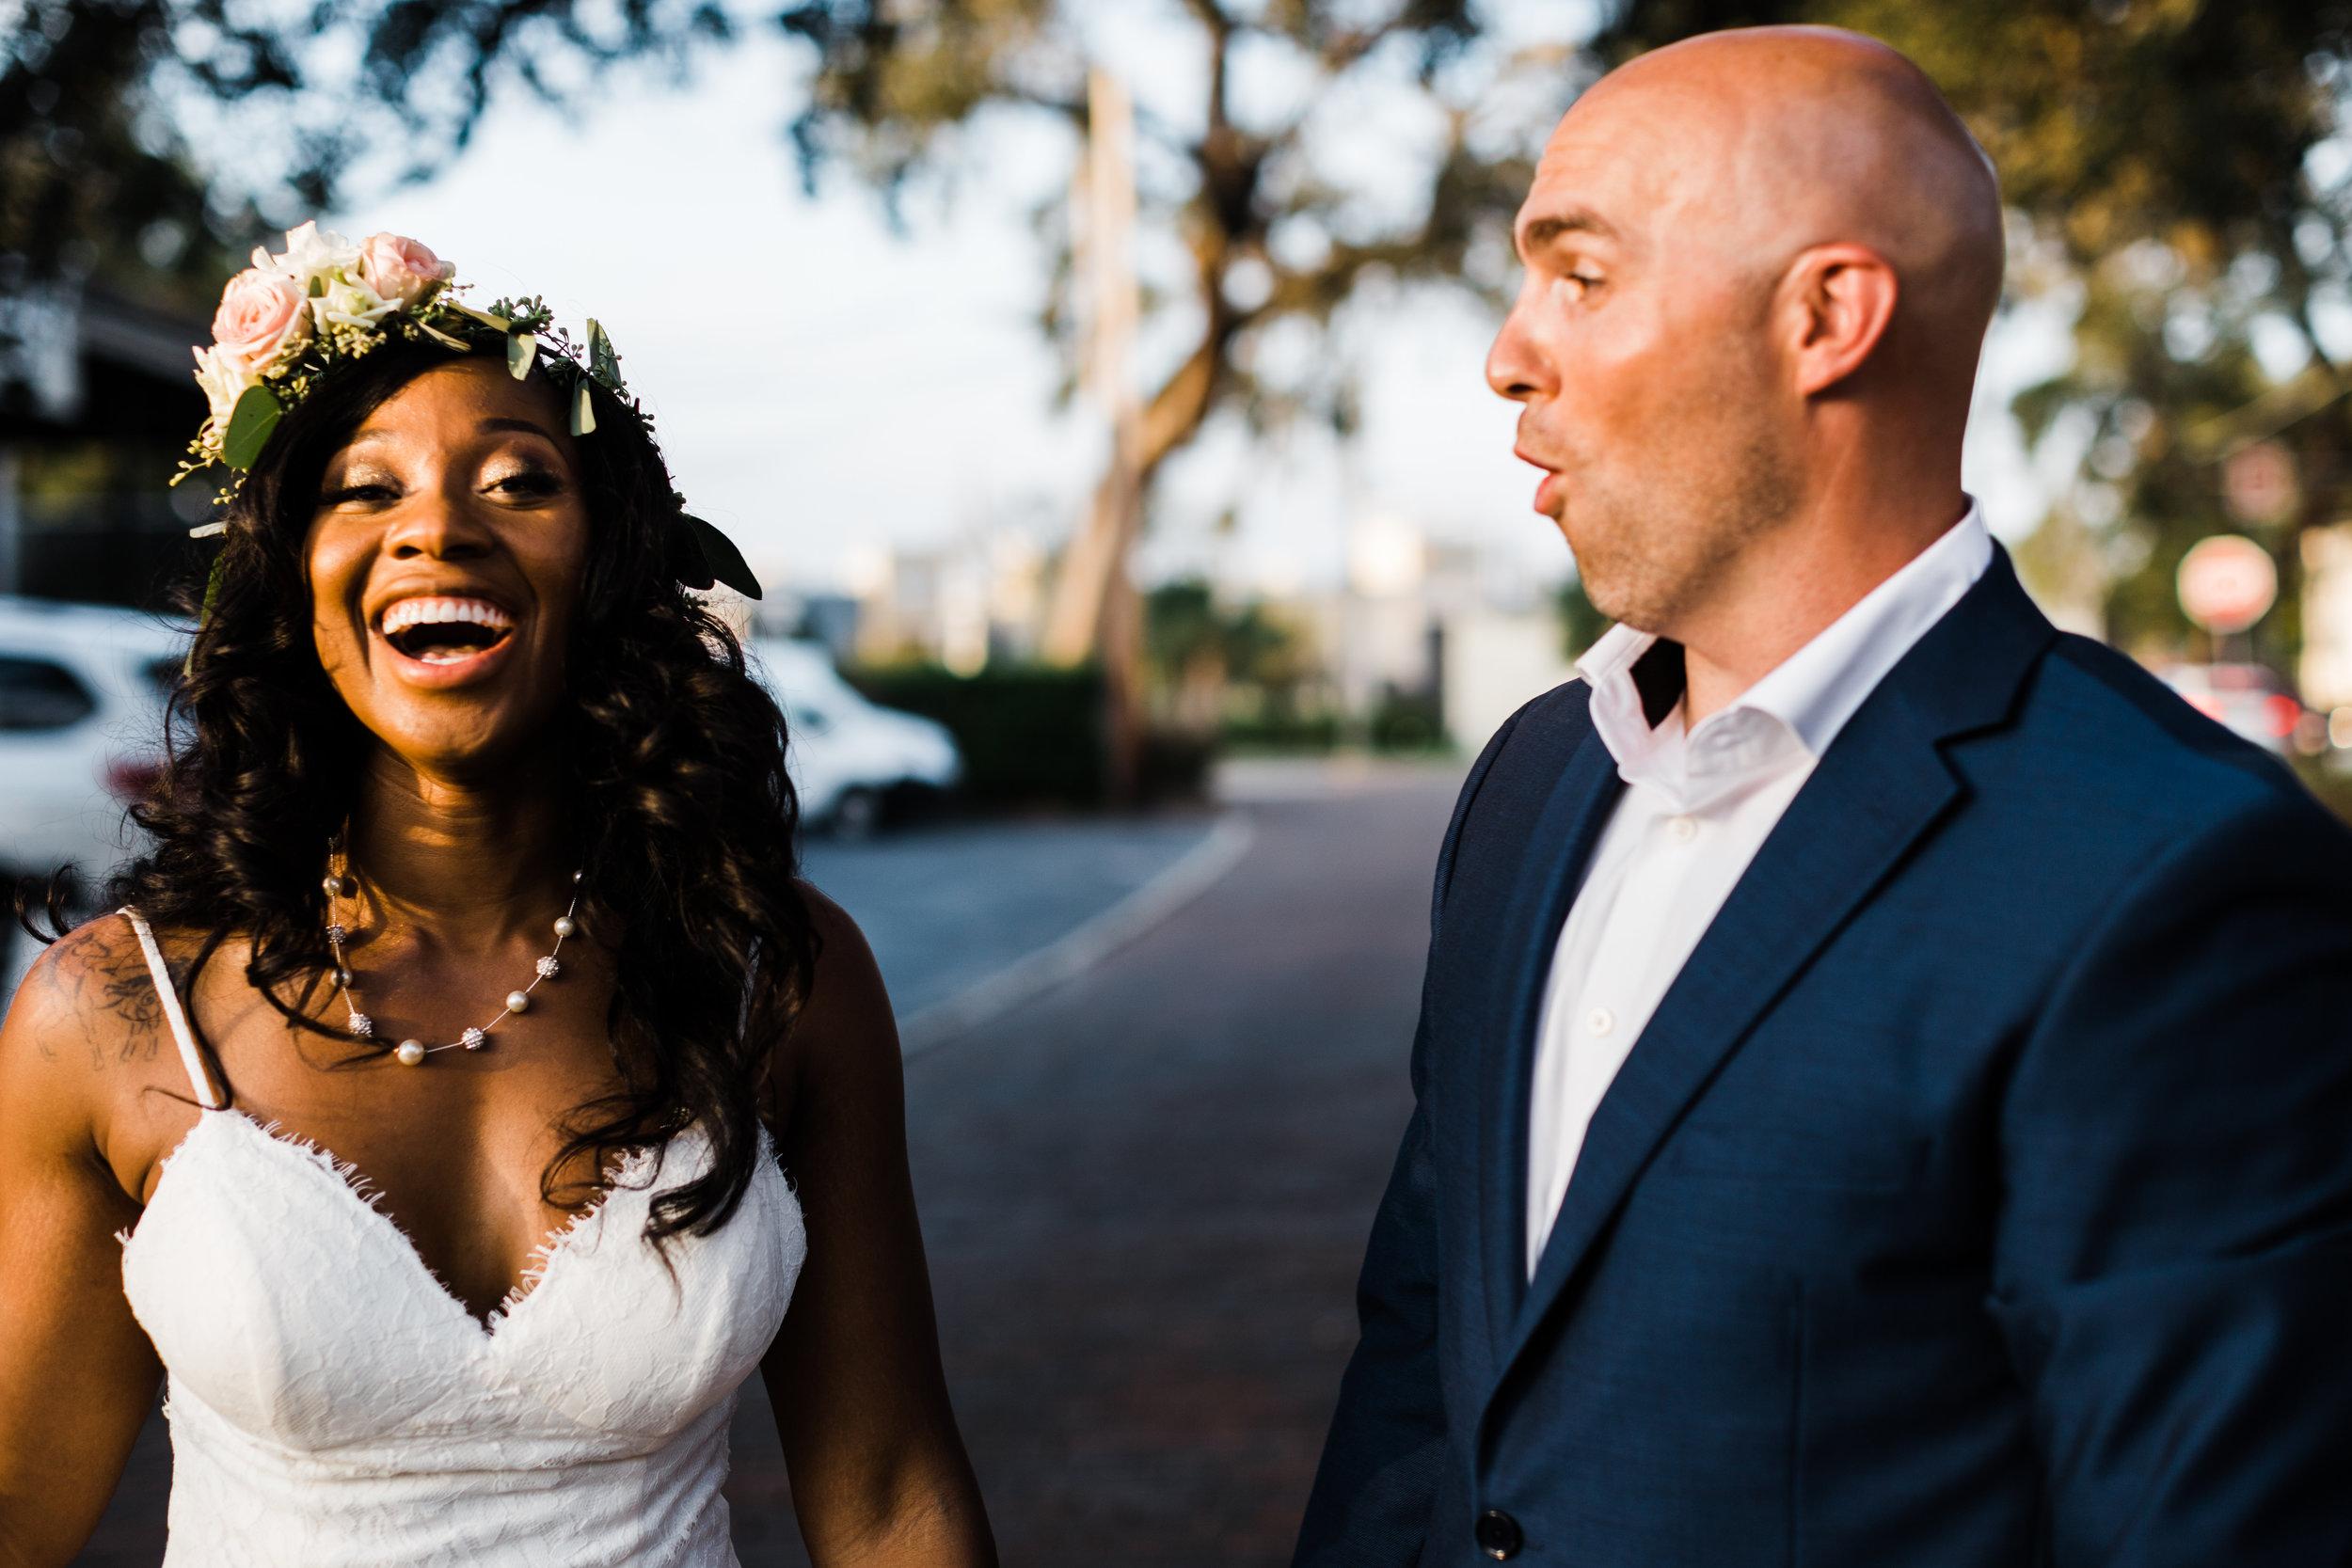 2017.09.16 Ashley and Chuck O'Day Quantam Leap Winery Wedding (426 of 462).jpg